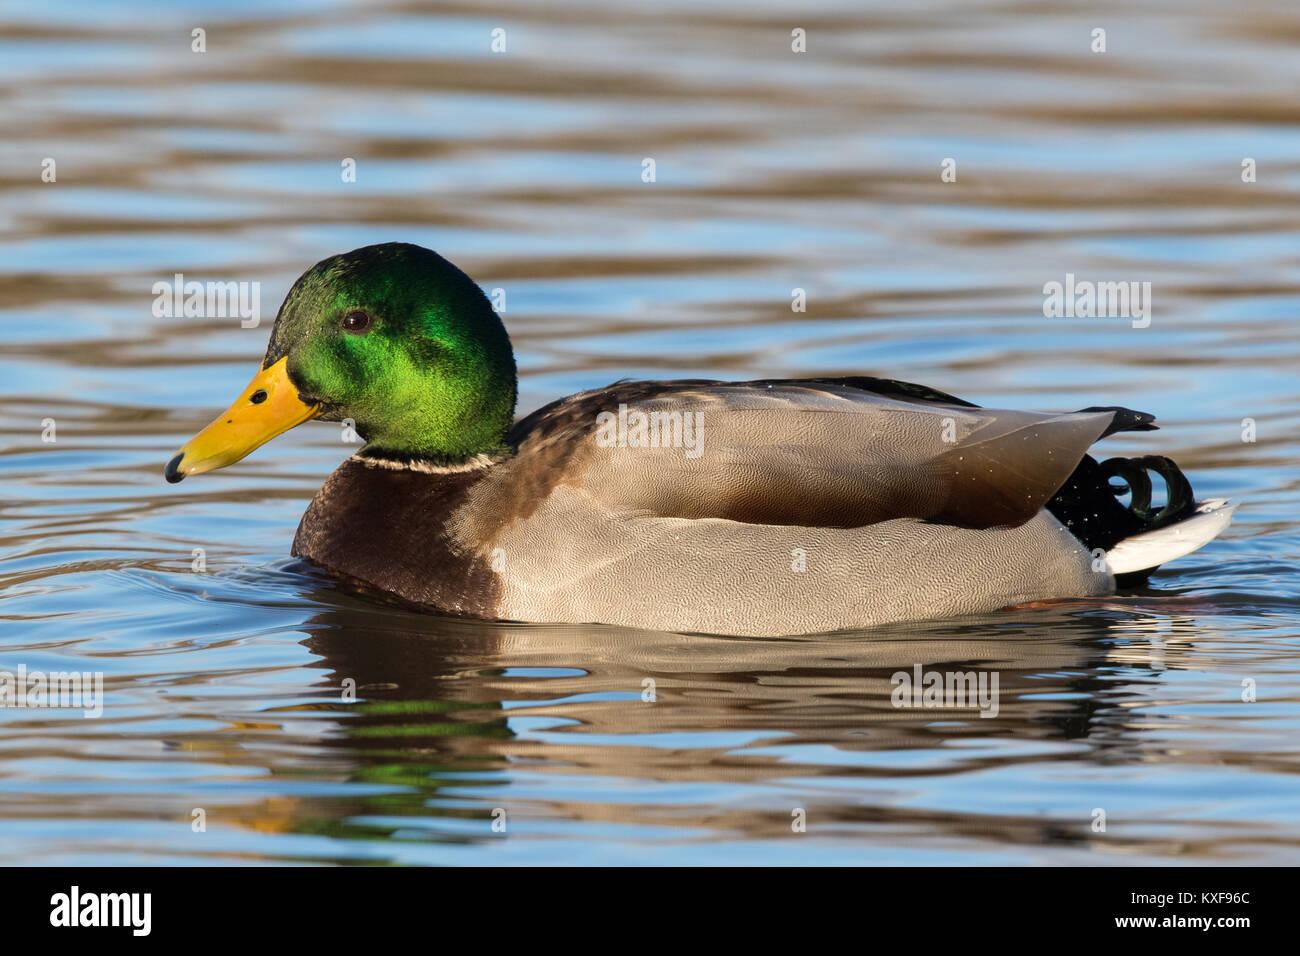 male Mallard (Anas platyrhynchos) swimming in a calm lake - Stock Image